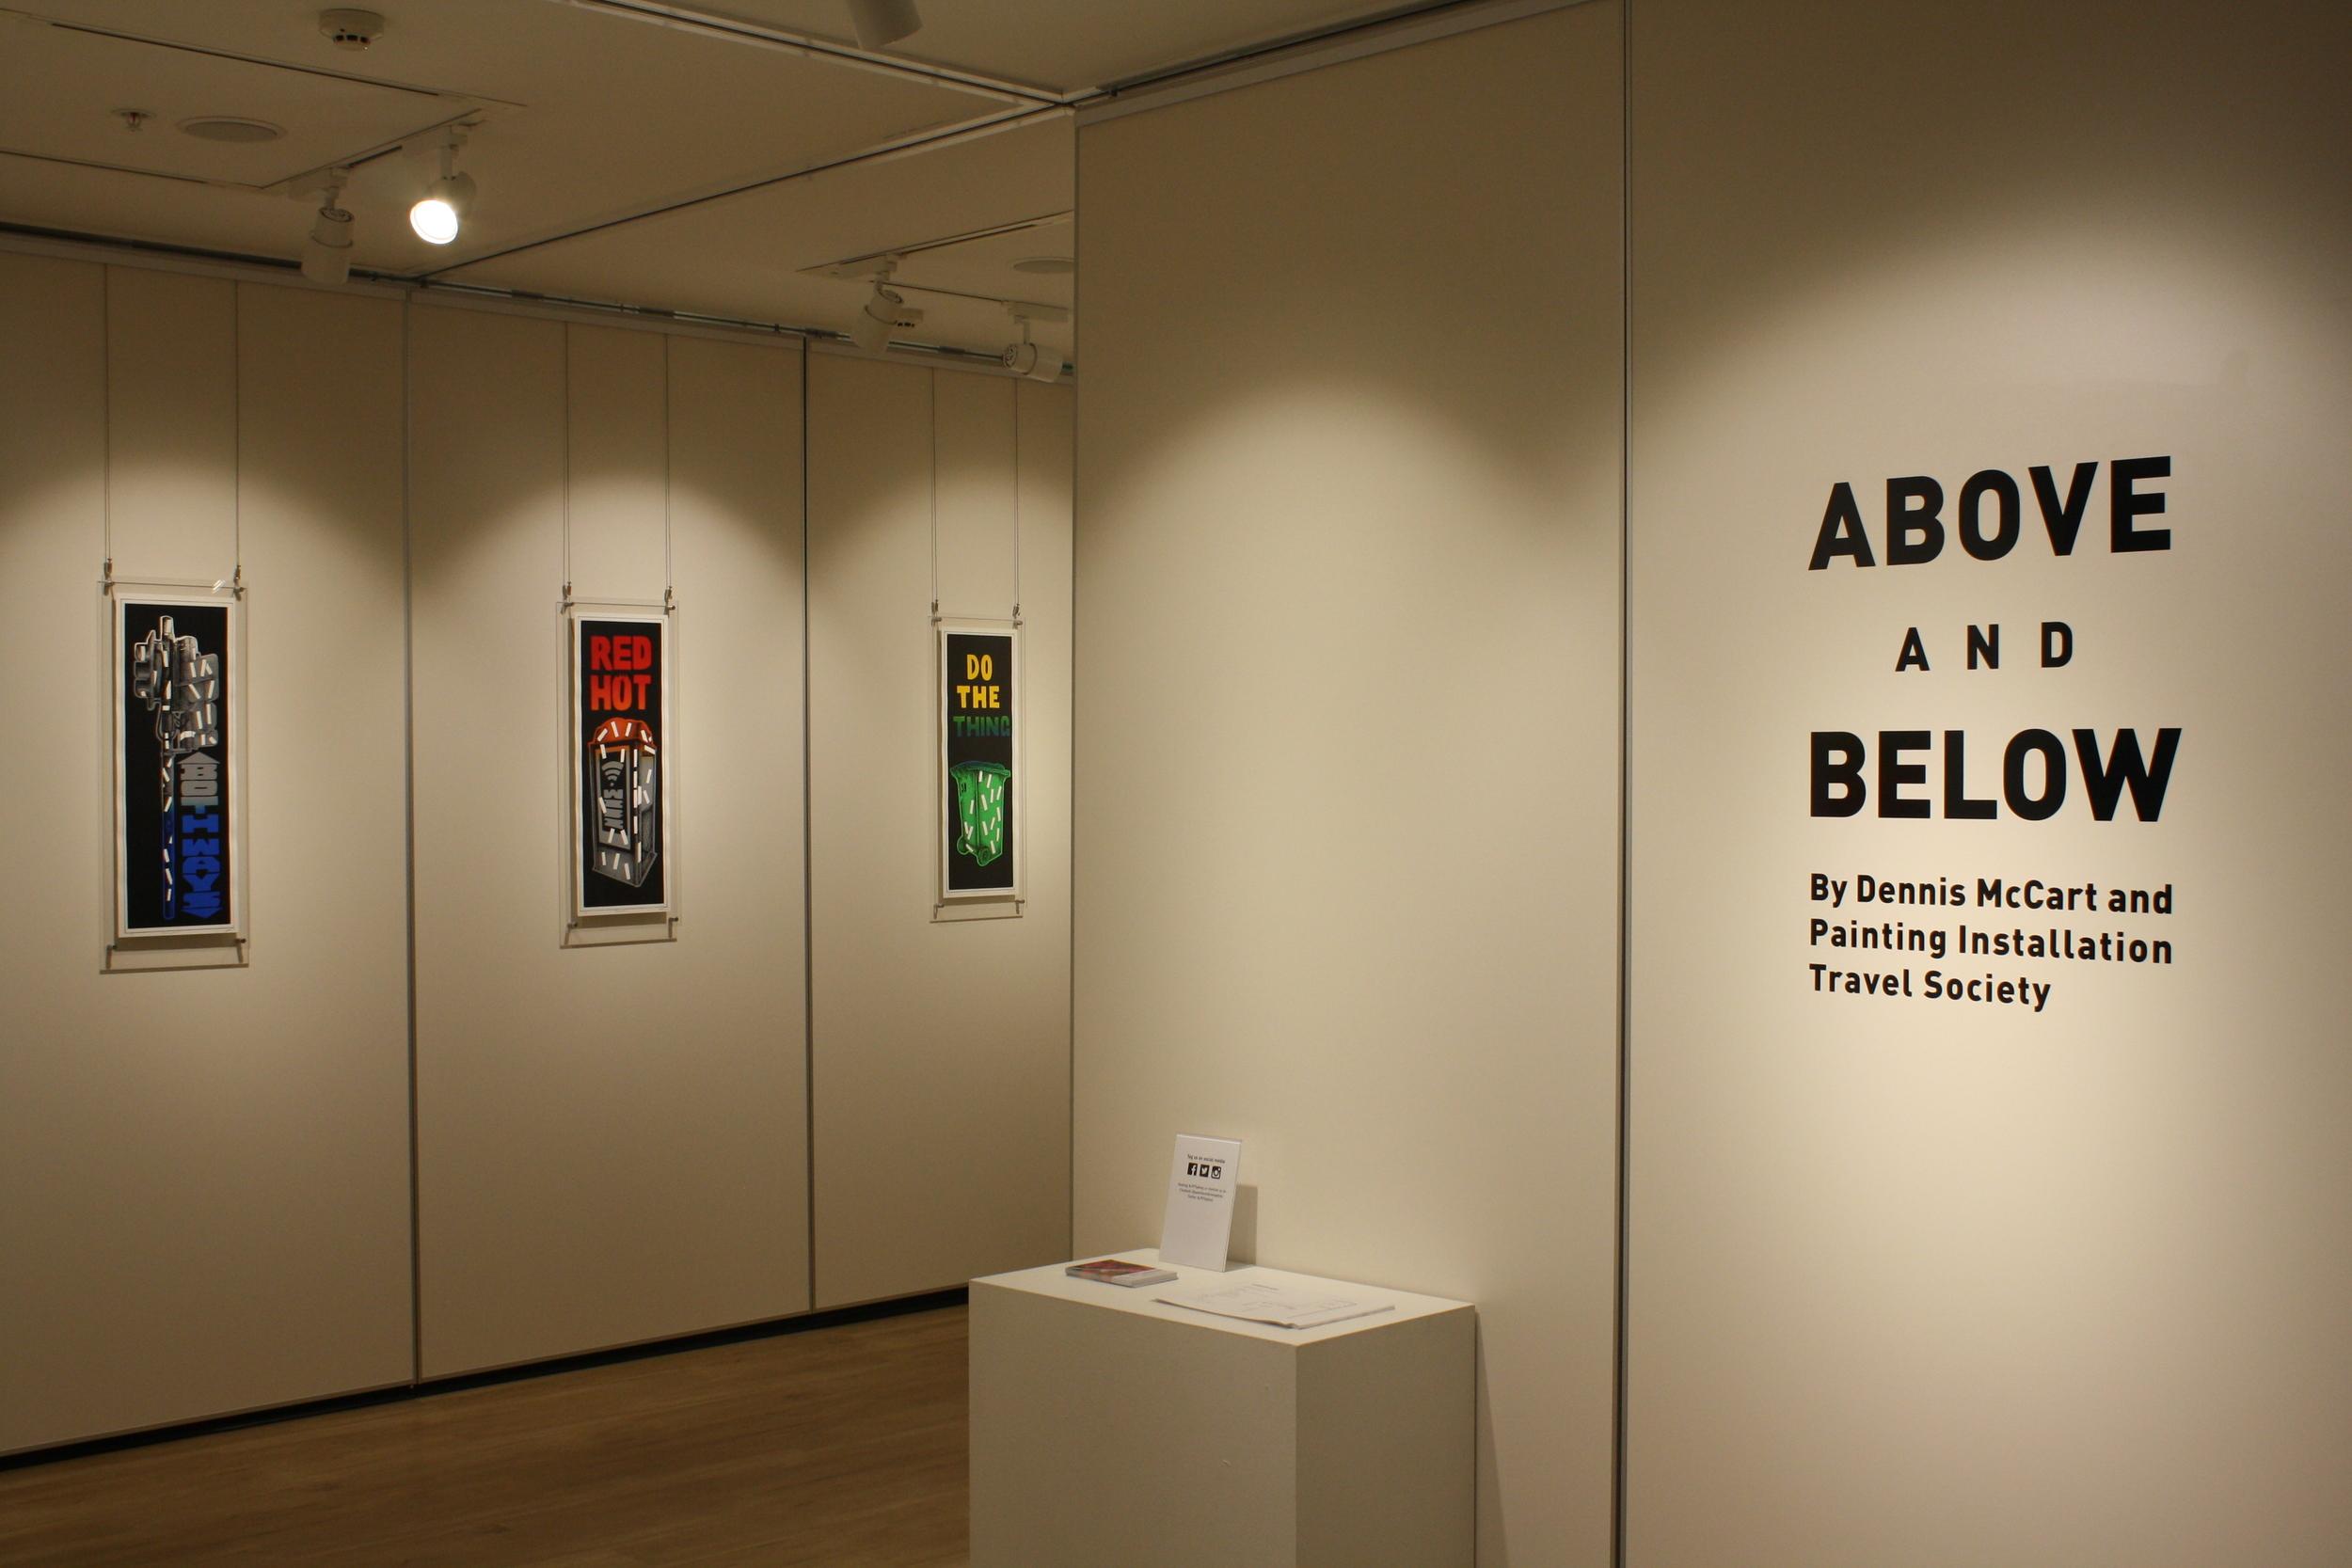 Image Credit: The Japan Foundation